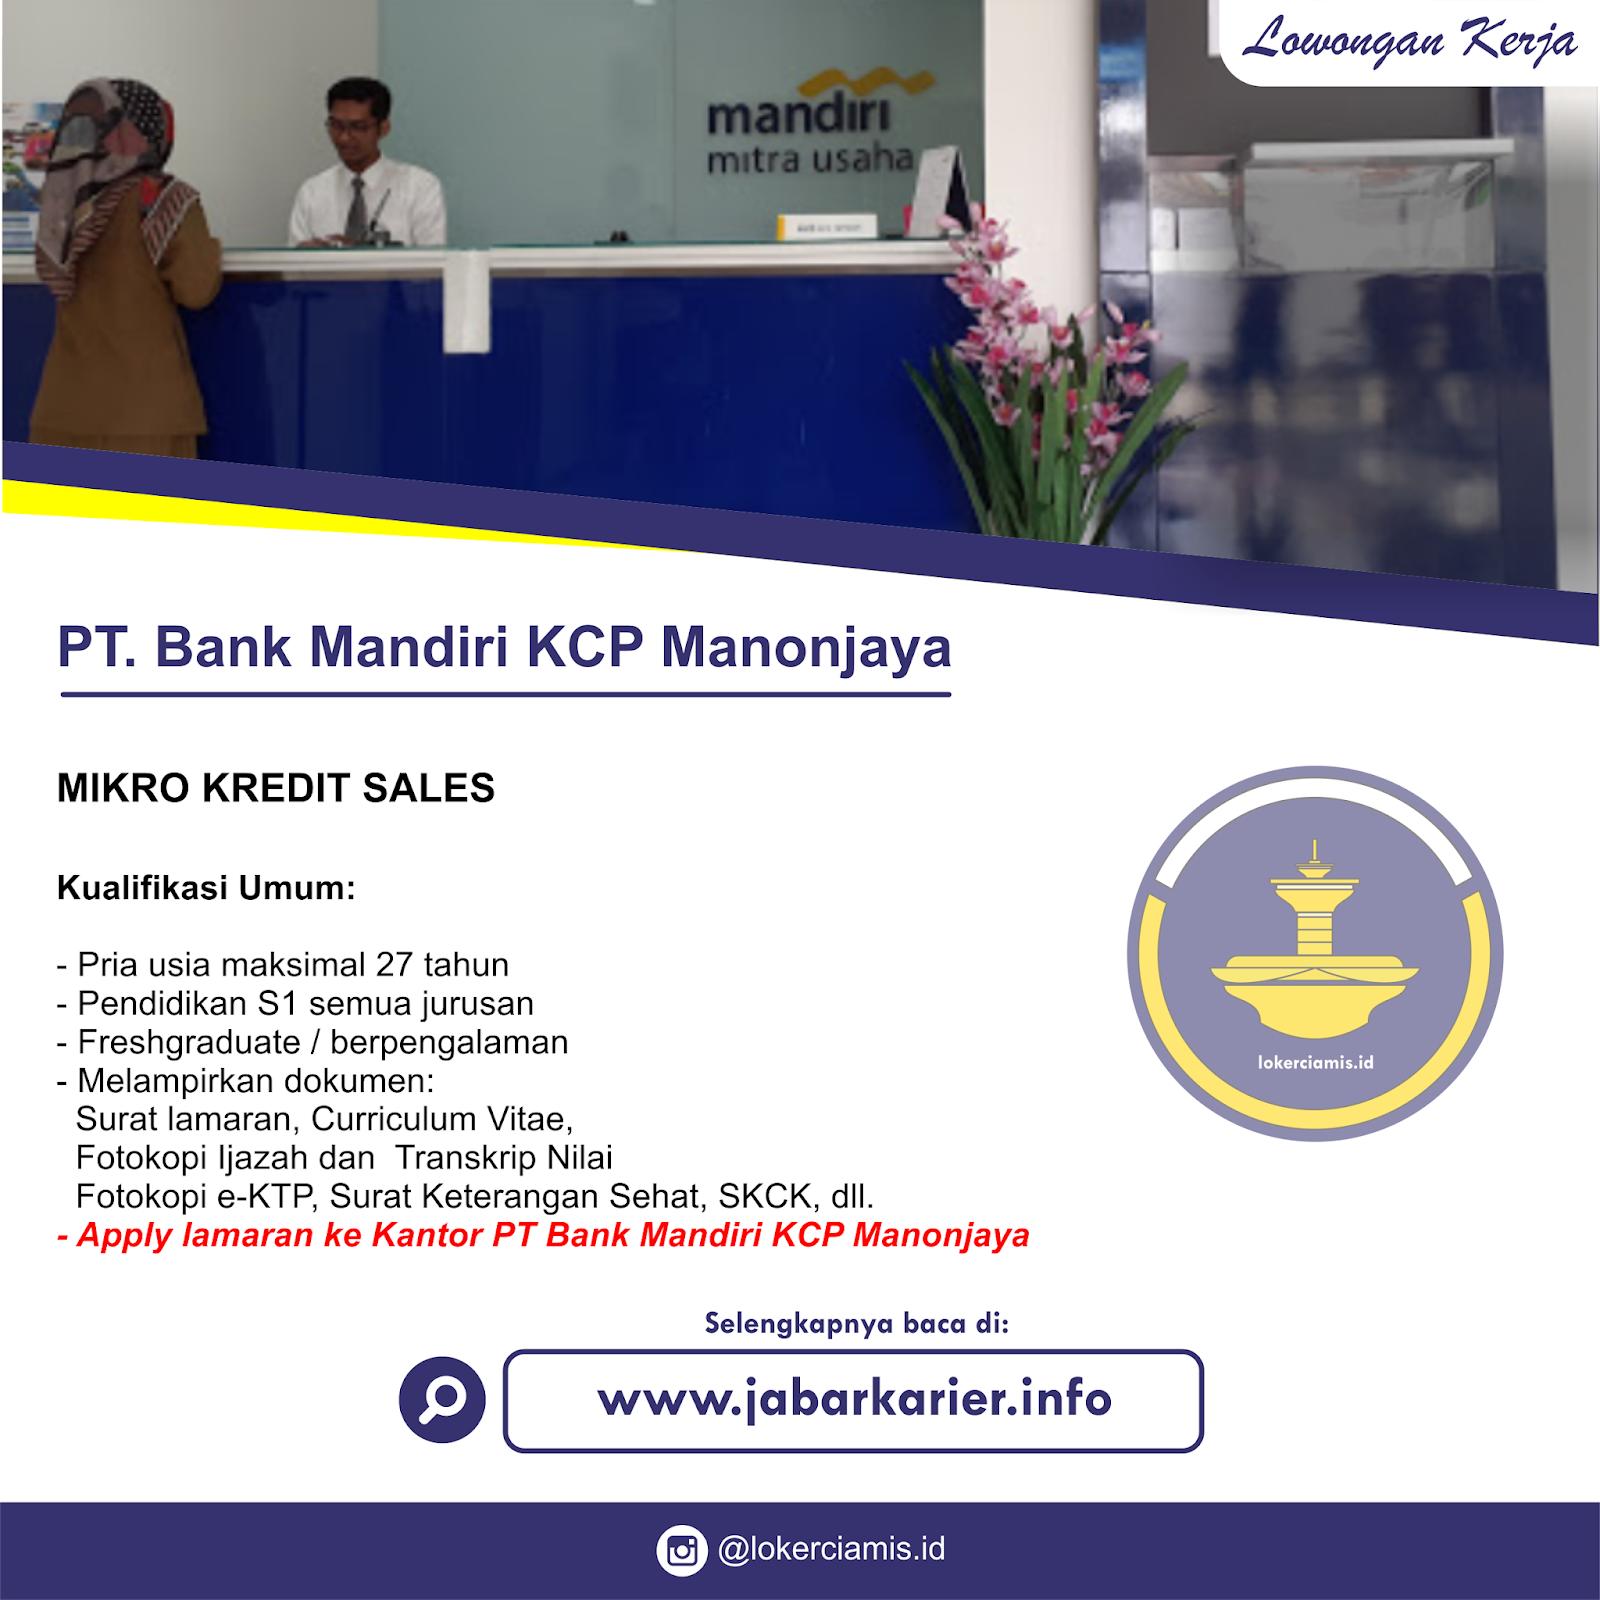 Loker Pt Bank Mandiri Kcp Manonjaya Tasikmalaya Terbaru Bulan September 2019 Lowongan Kerja Terbaru Tahun 2020 Informasi Rekrutmen Cpns Pppk 2020